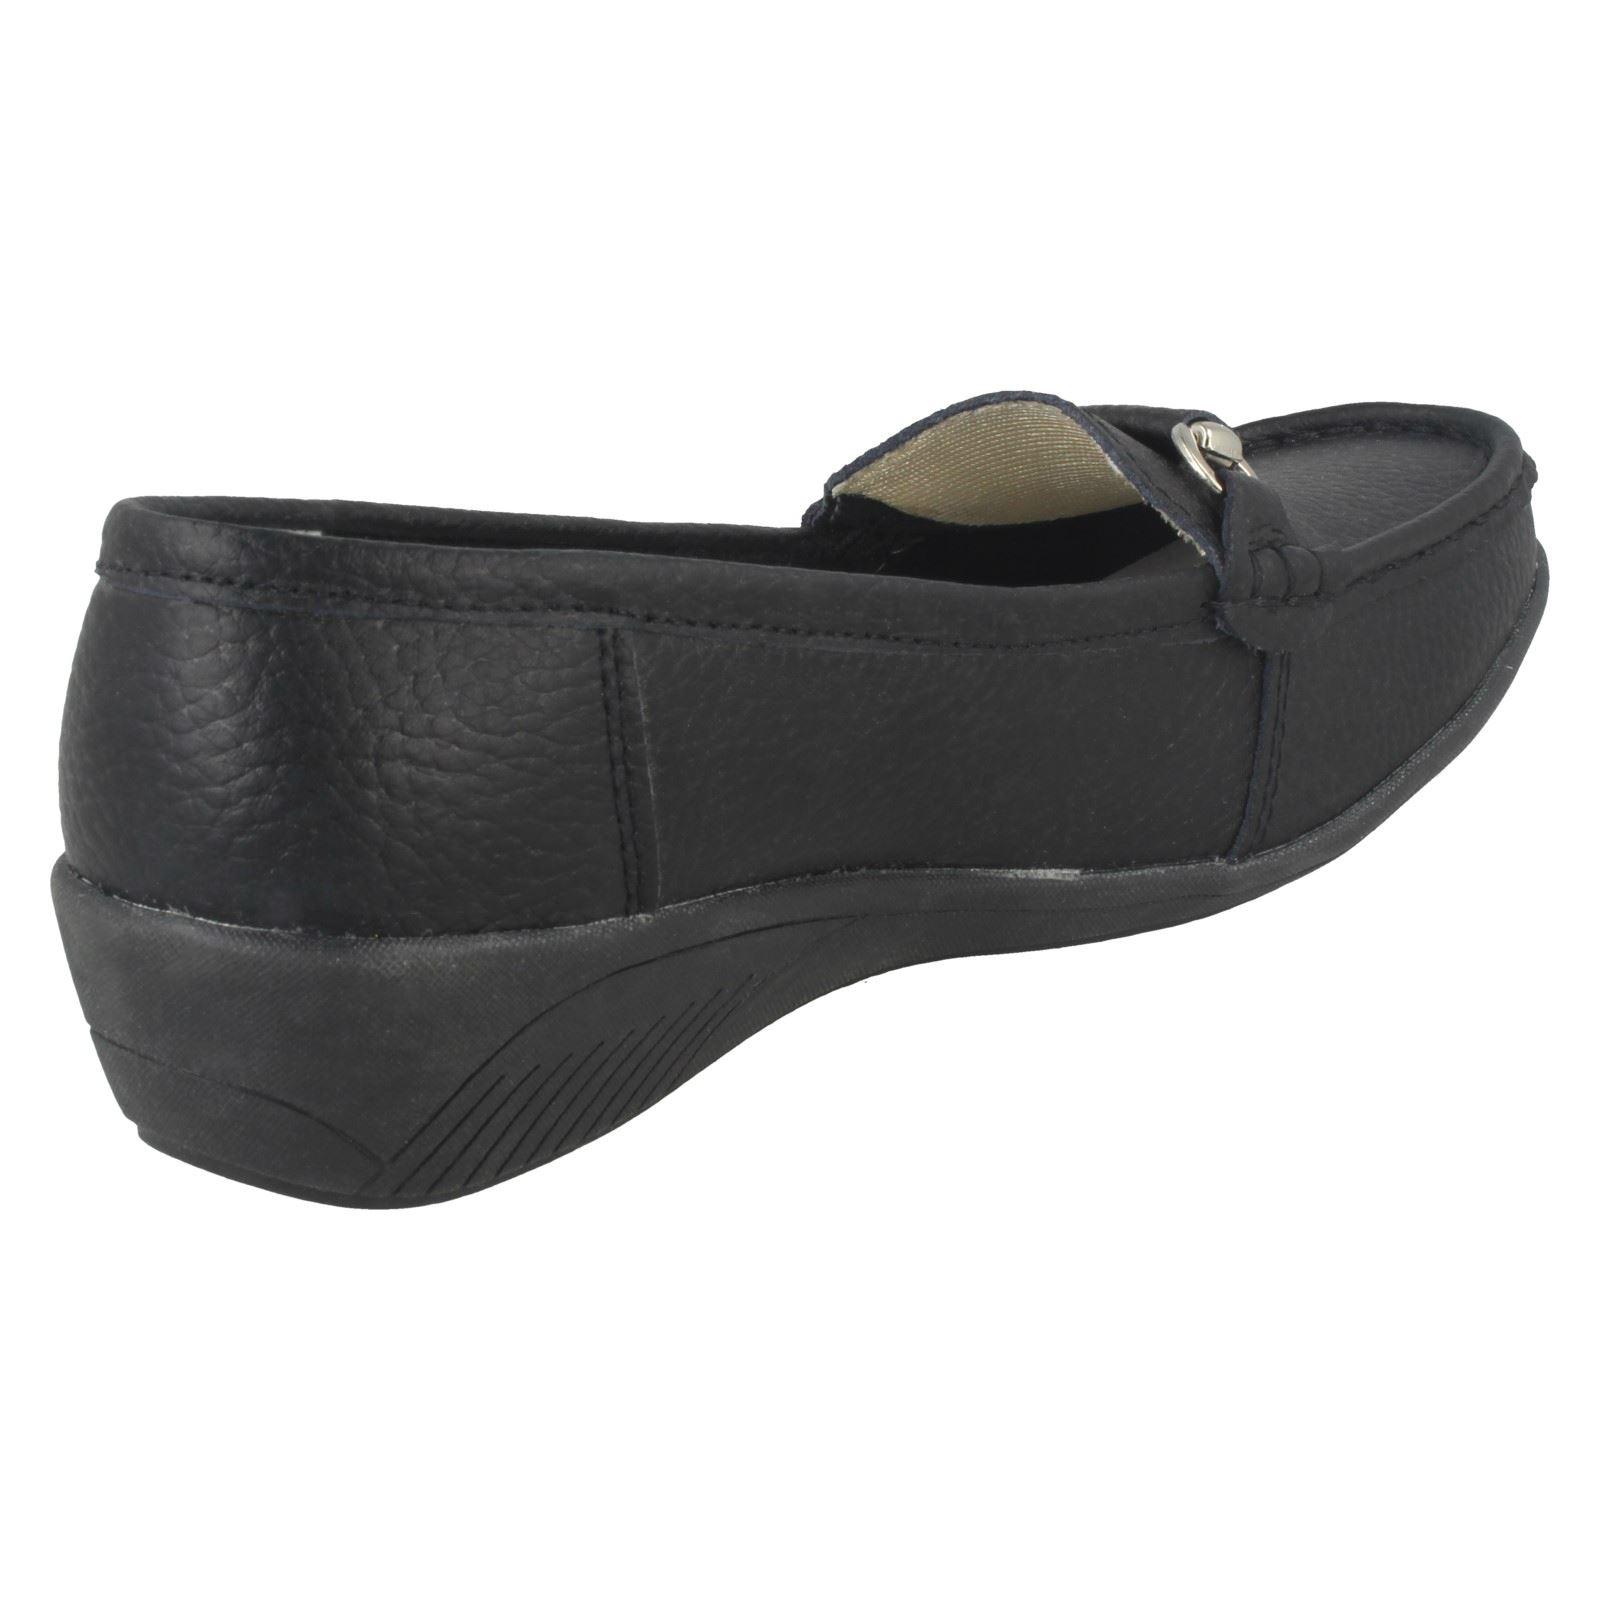 Flat Shoes Ladies Eaze Mocassin Style